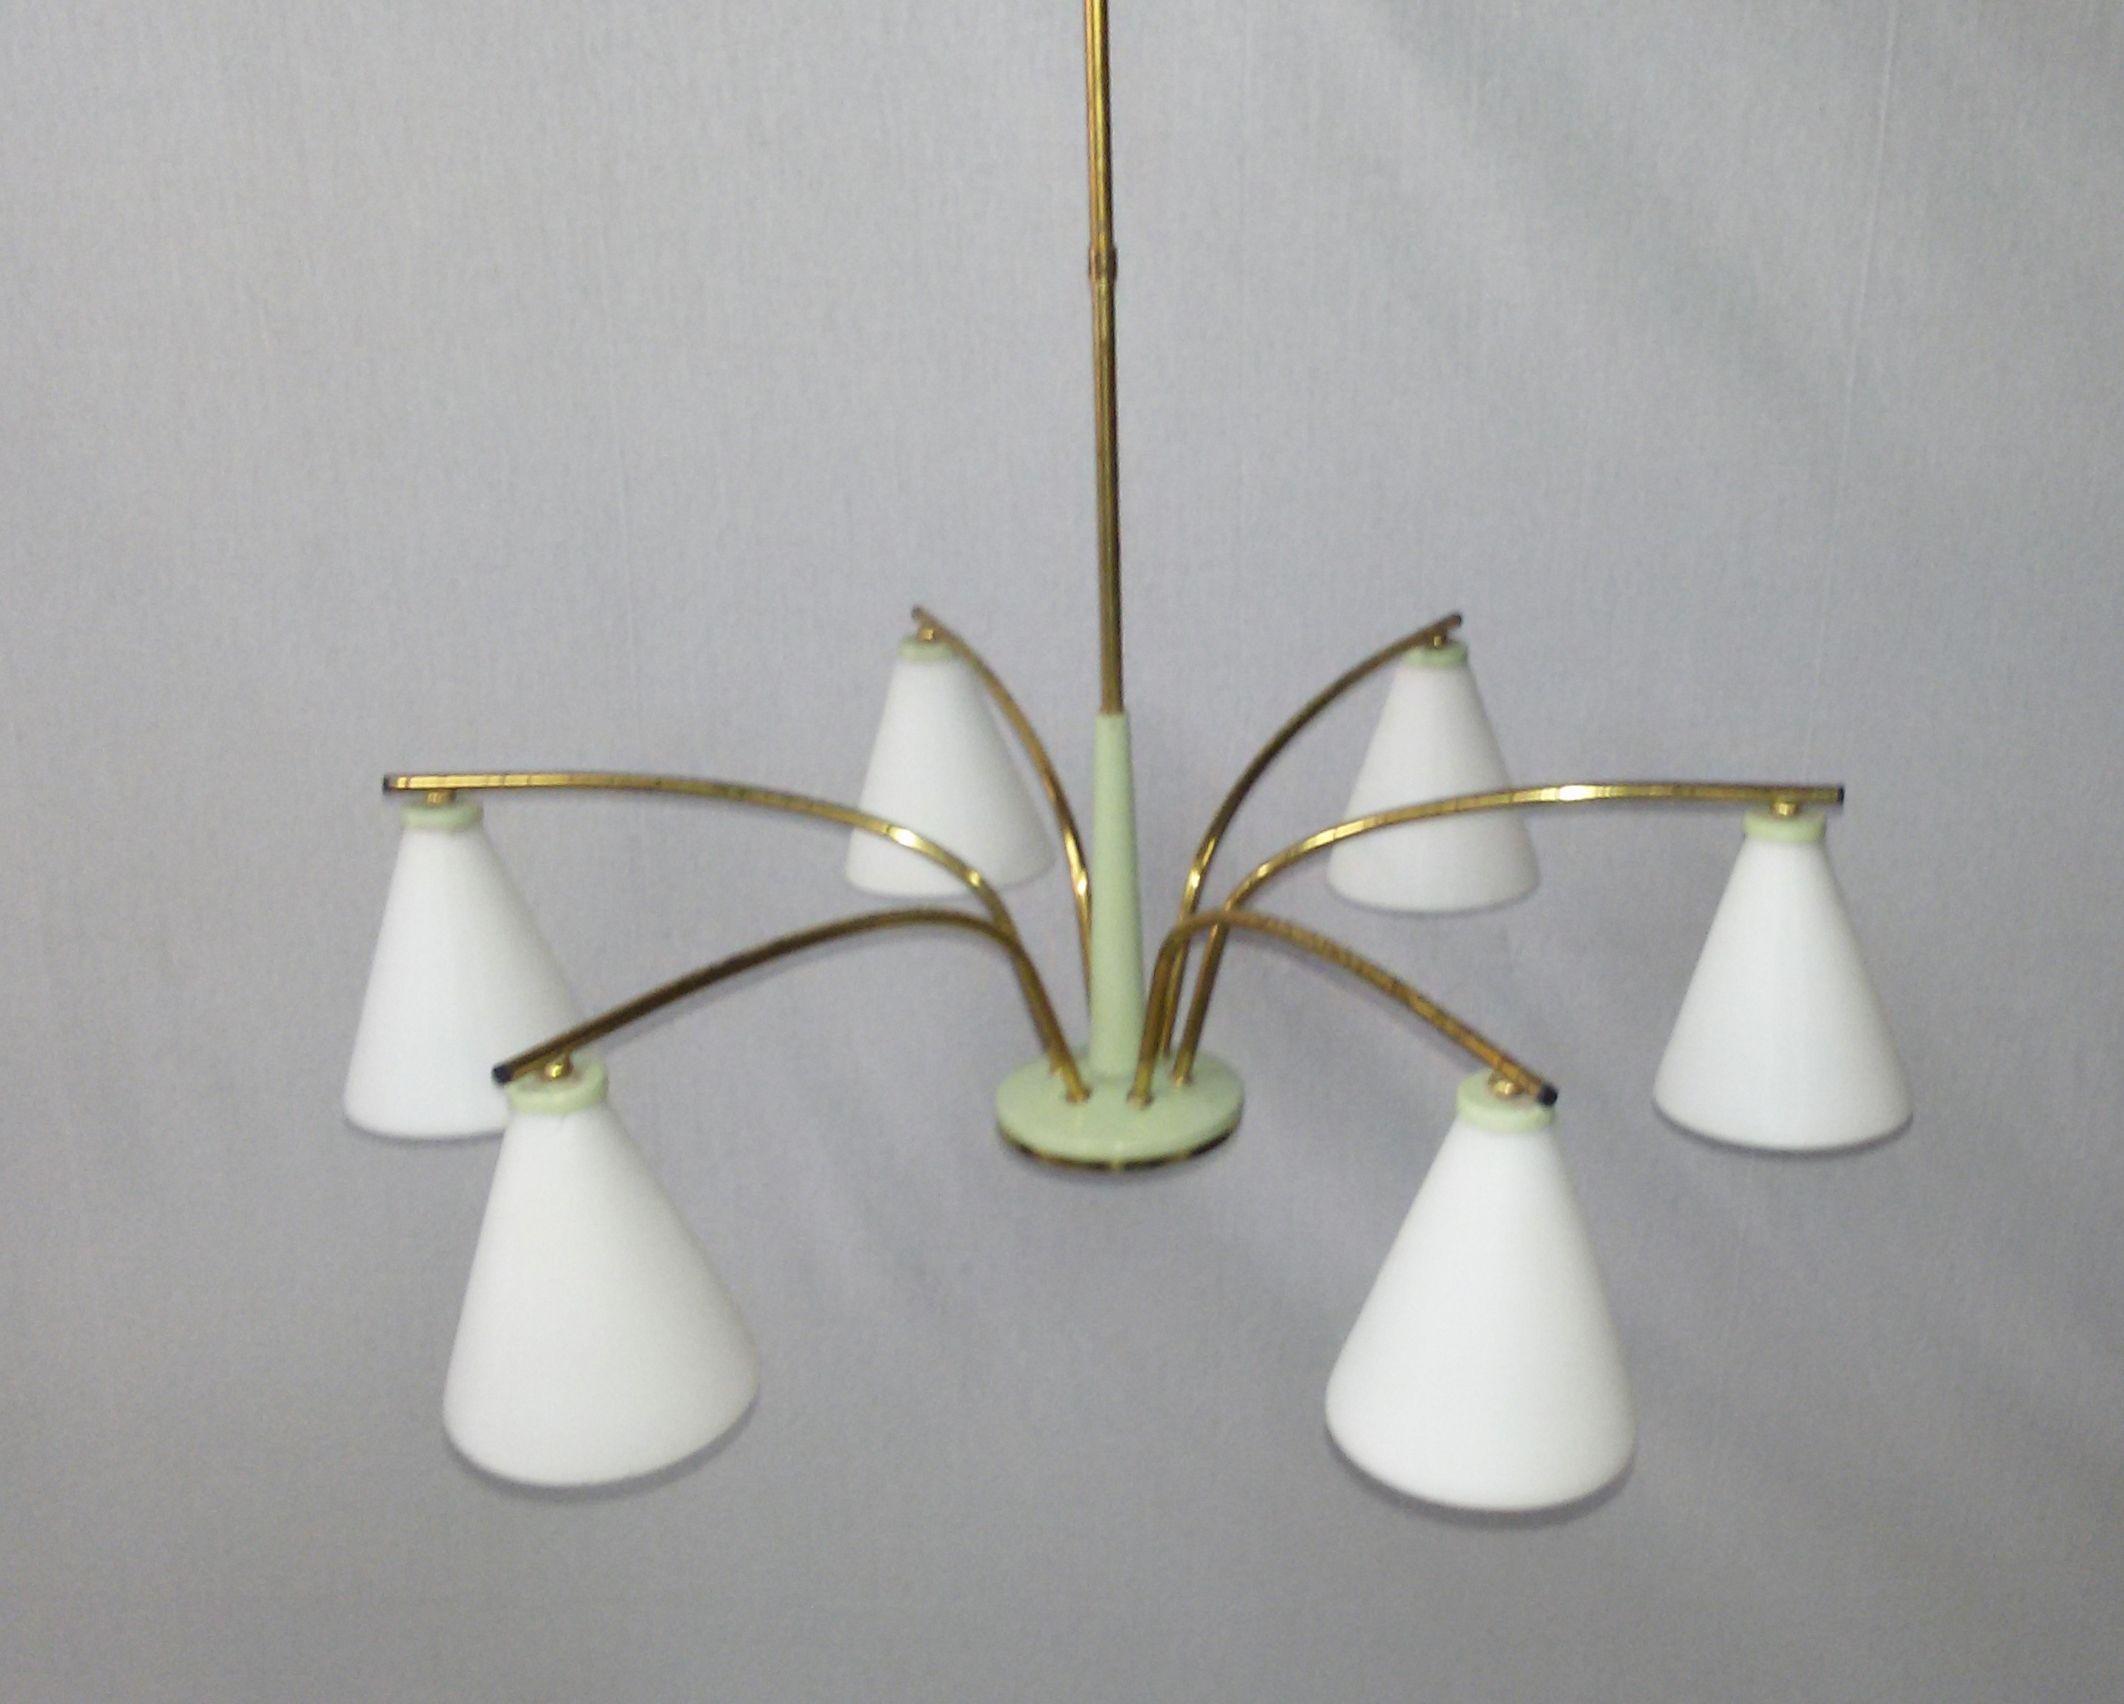 Lampadario chandelier 6 luci ottone design stilnovo for Lampadario vintage